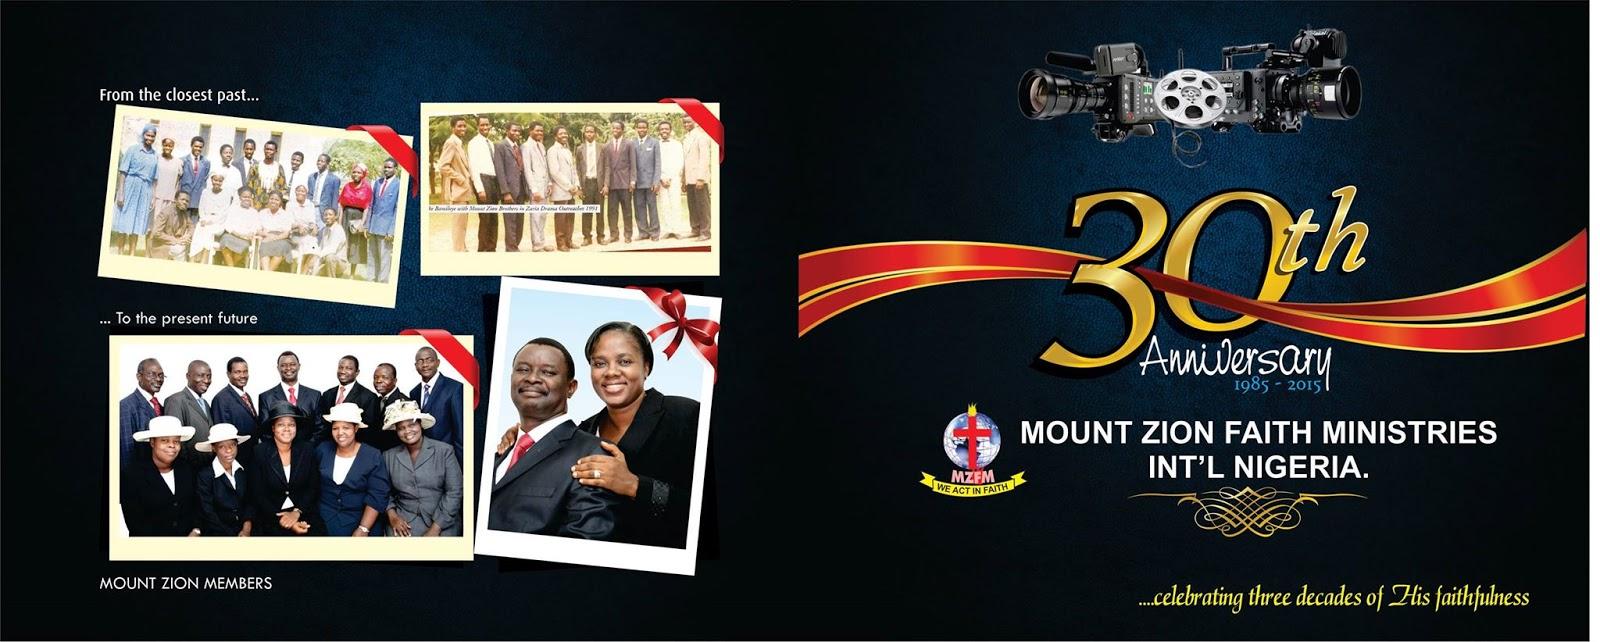 Mount zion faith ministries at 30